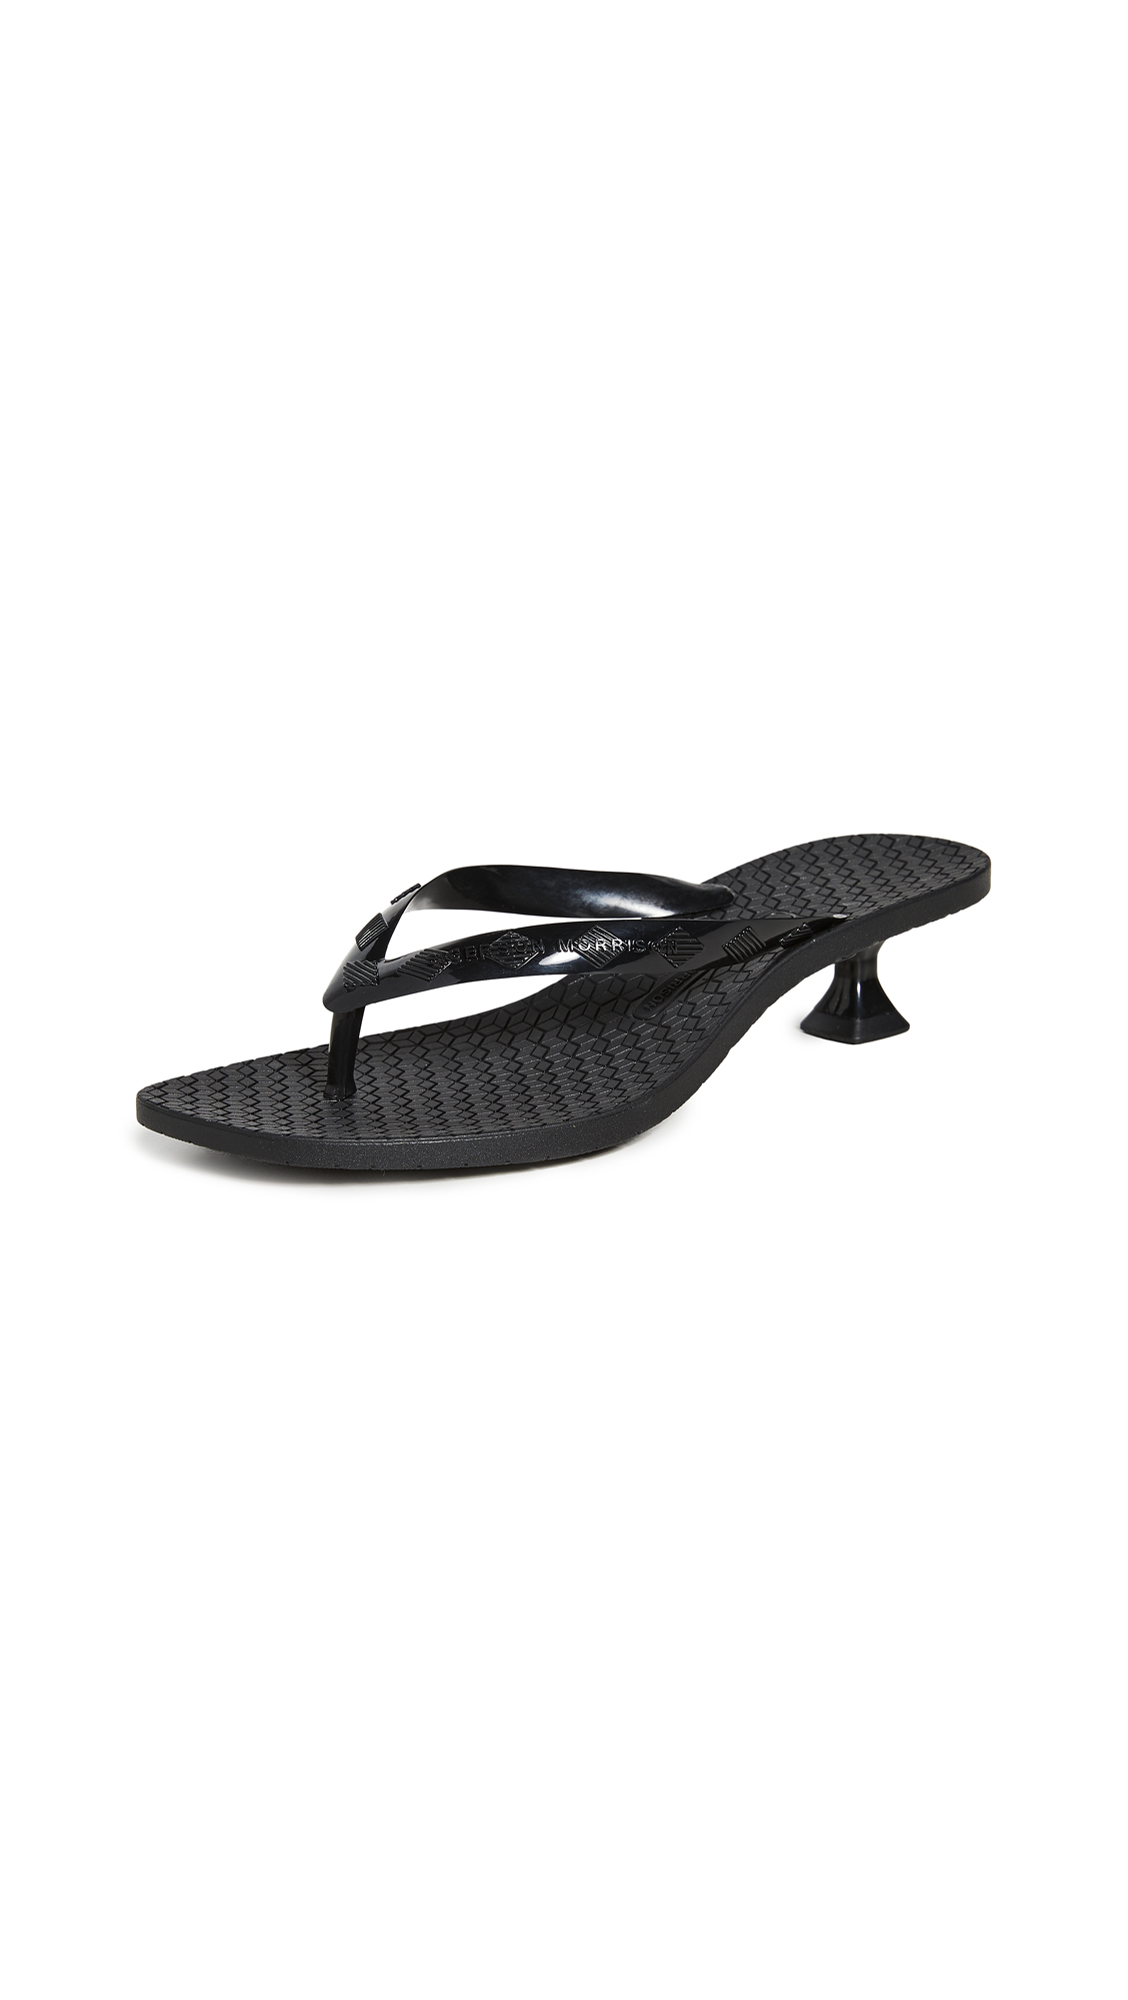 Sigerson Morrison Jewel Sandals - 30% Off Sale